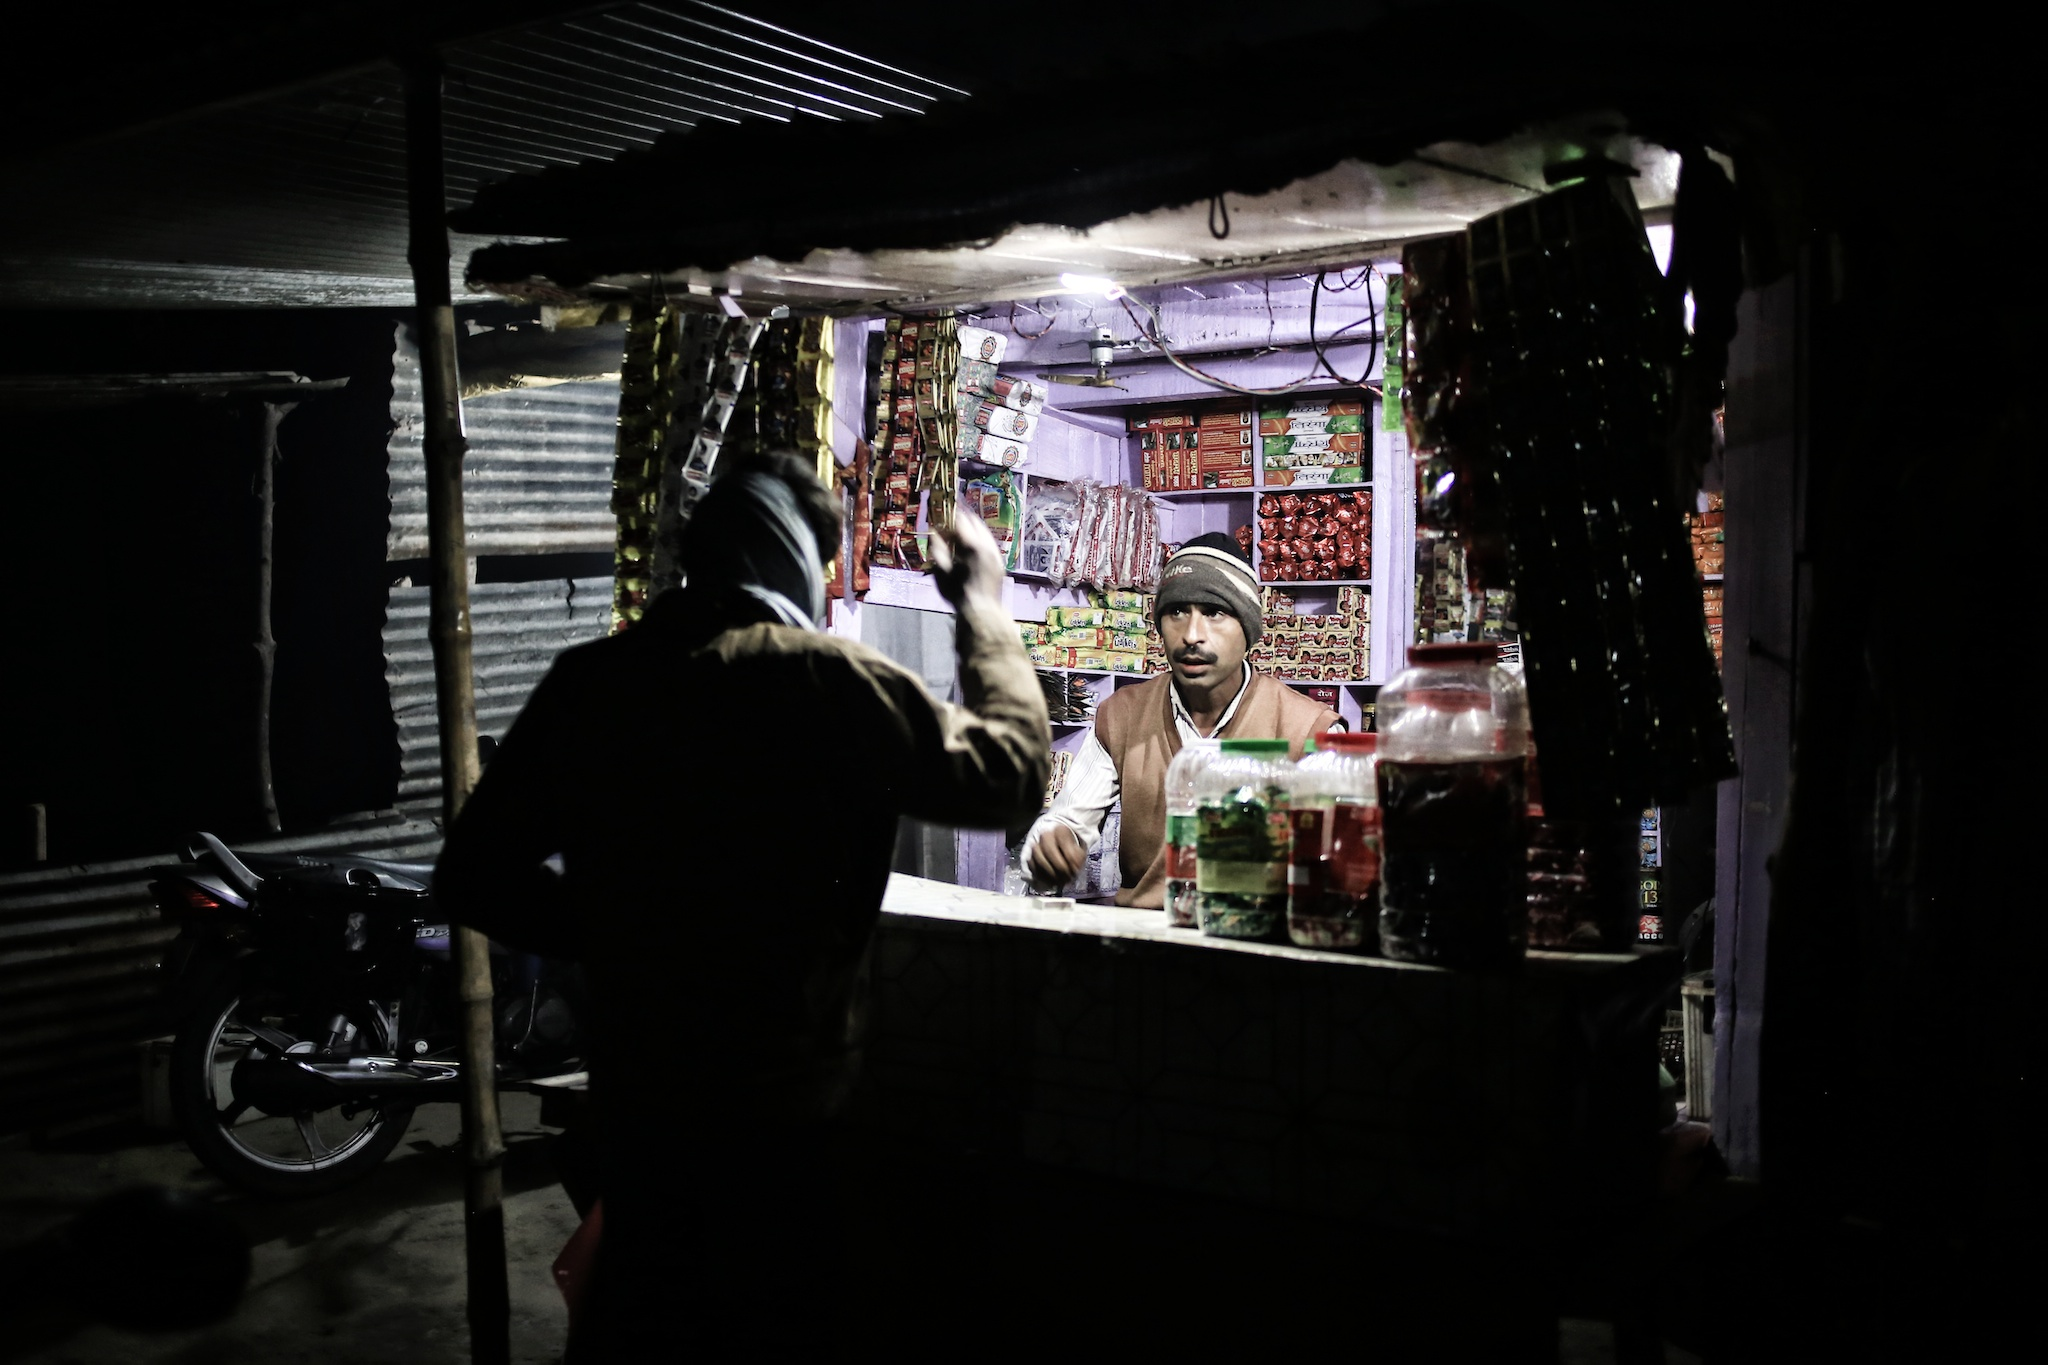 Small kiosk lit up by microgrid solar. Photo via SunFunder